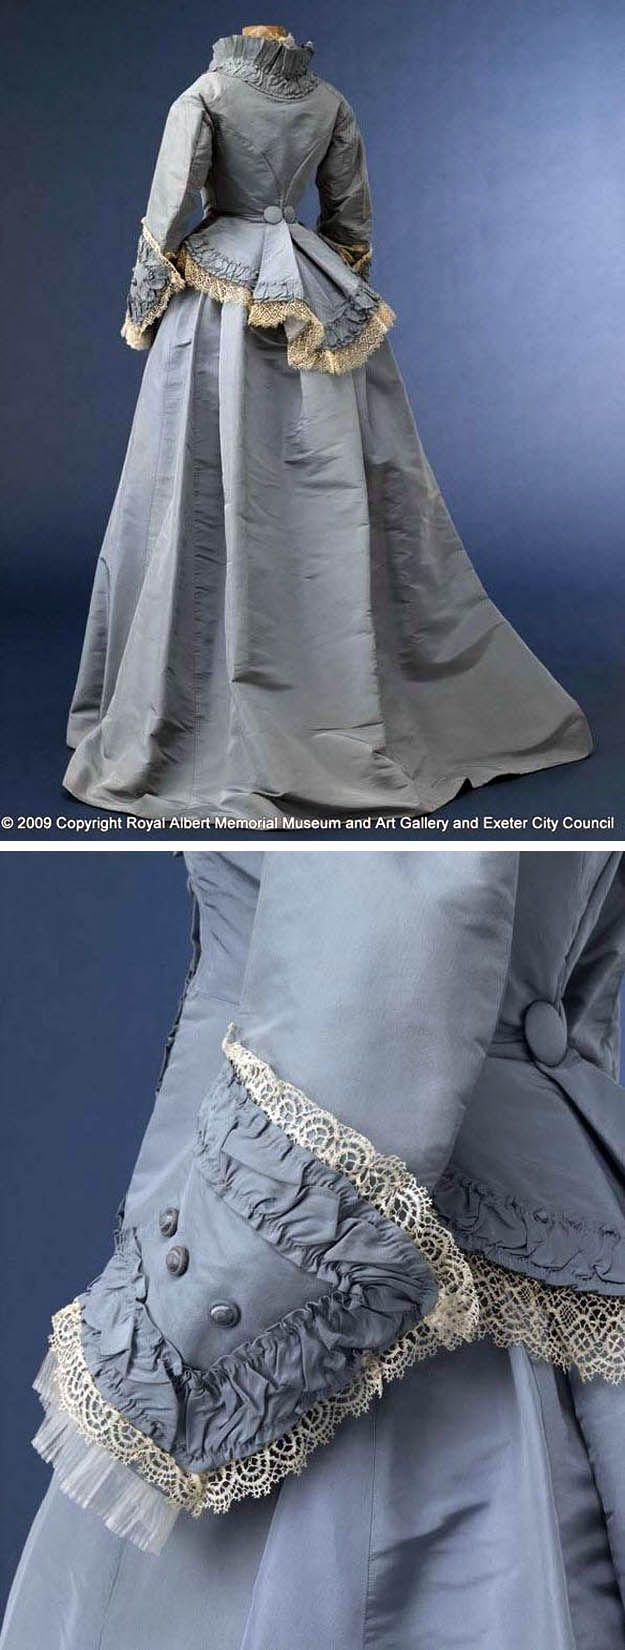 Ffdeeefdcdcbdadadfg pixels dress